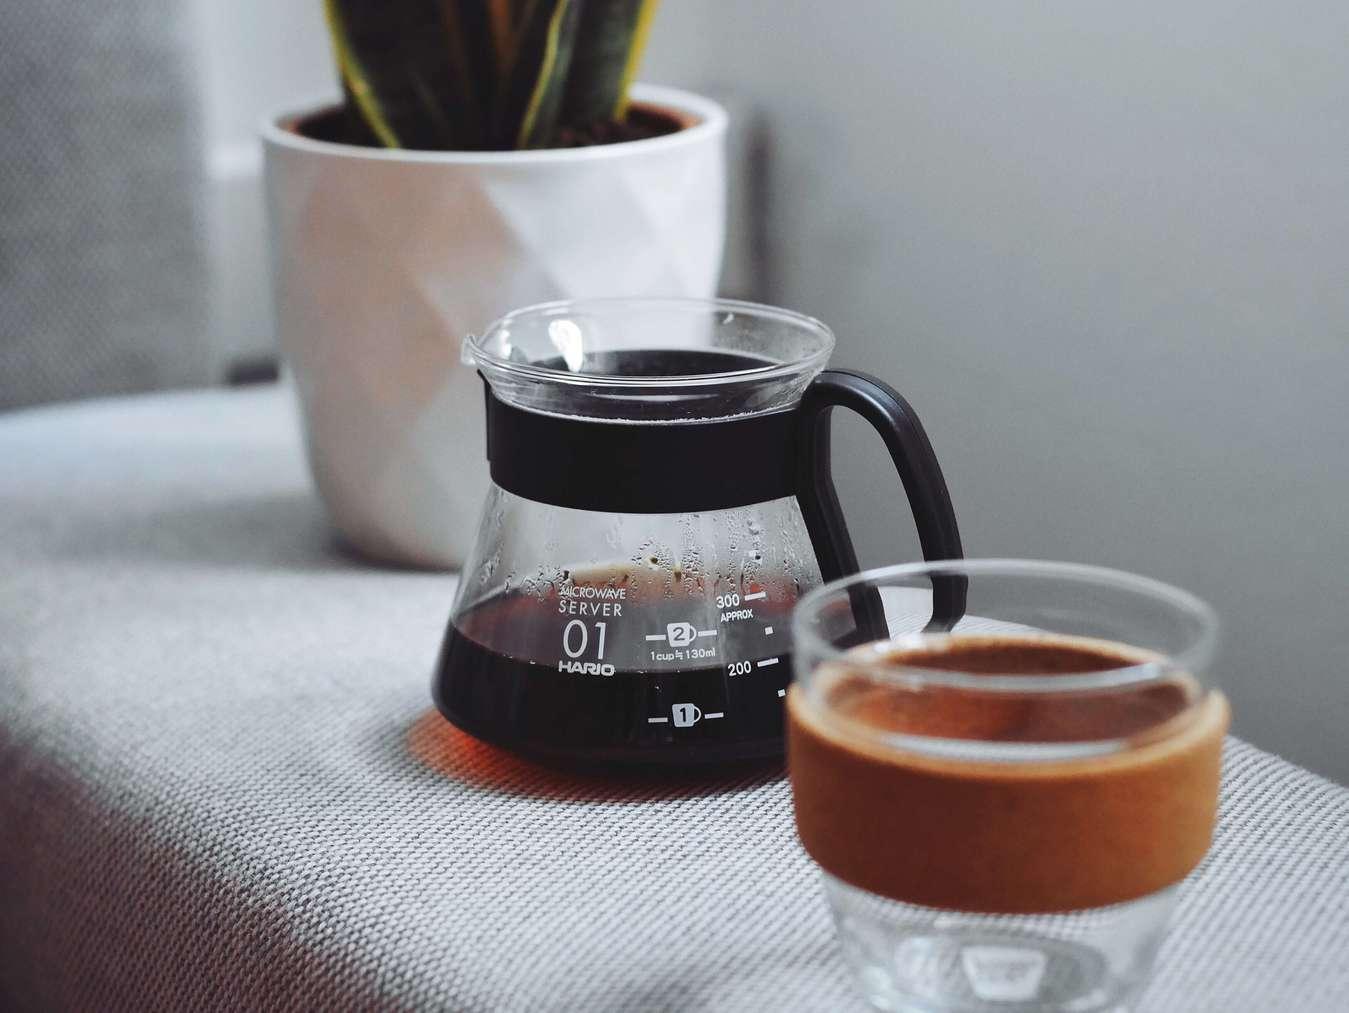 Copo reutilizável de café